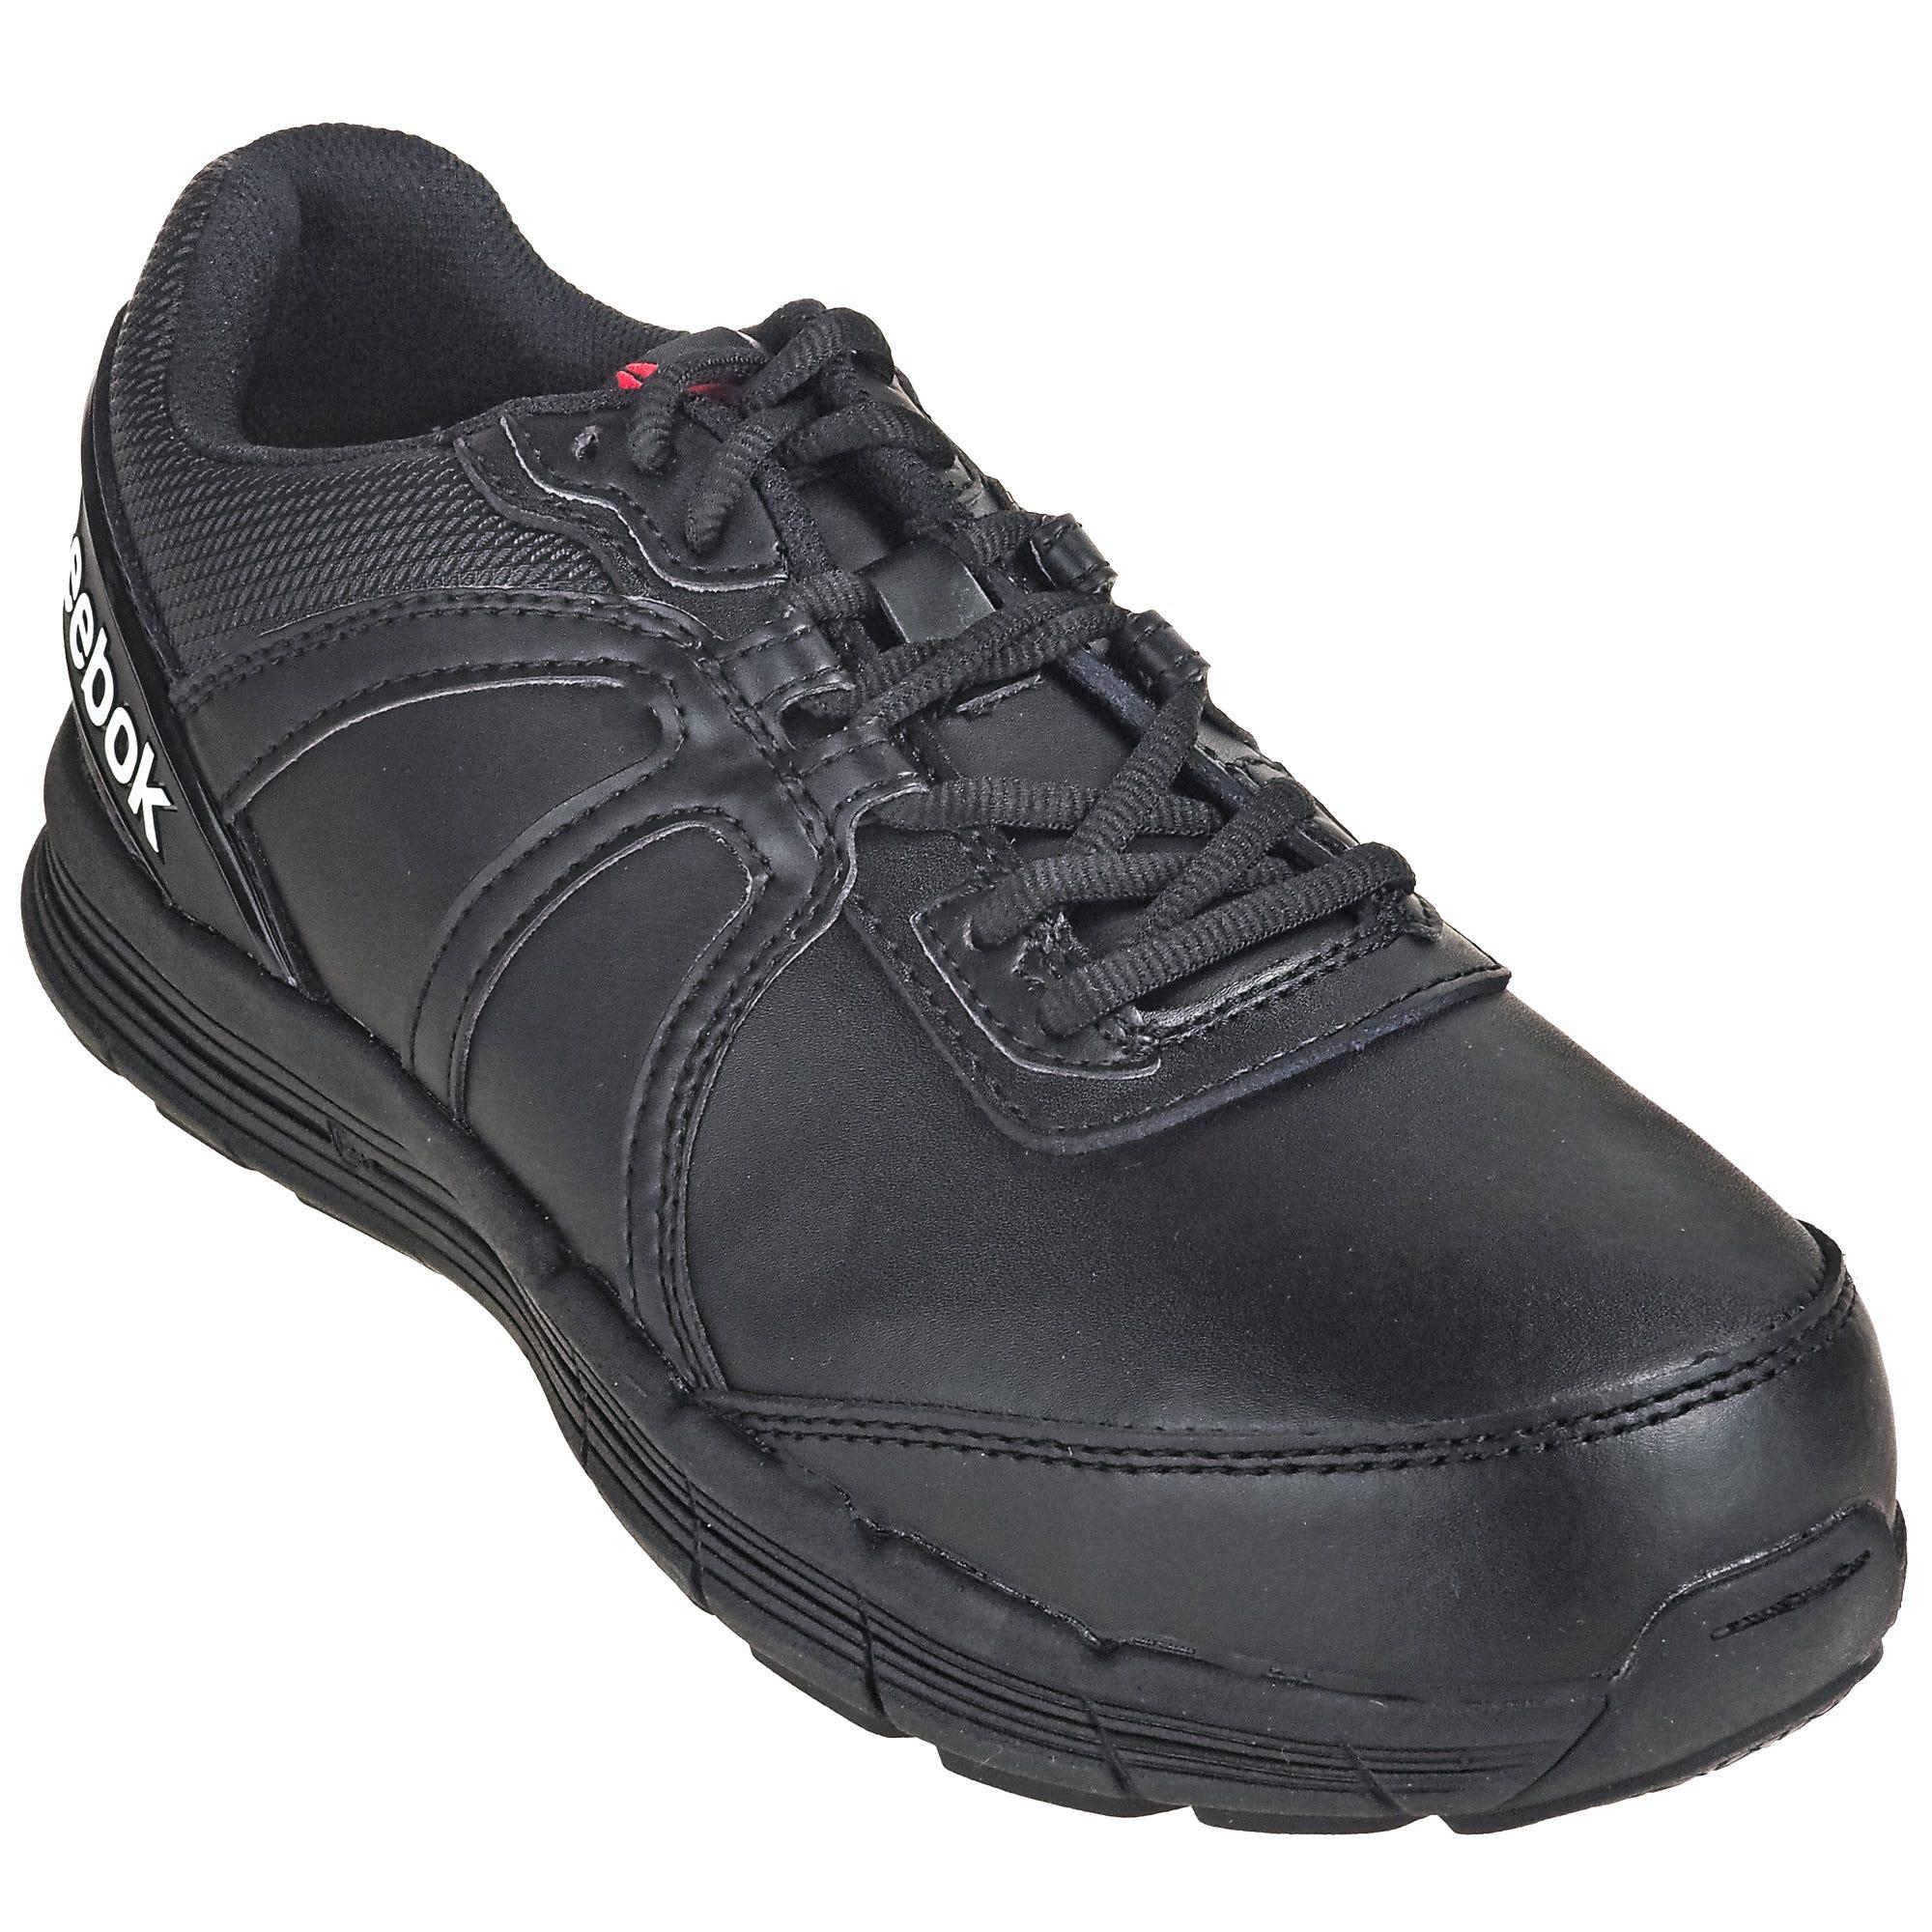 Reebok RB351 Steel Toe Women's ESD Black Guide Athletic Shoes